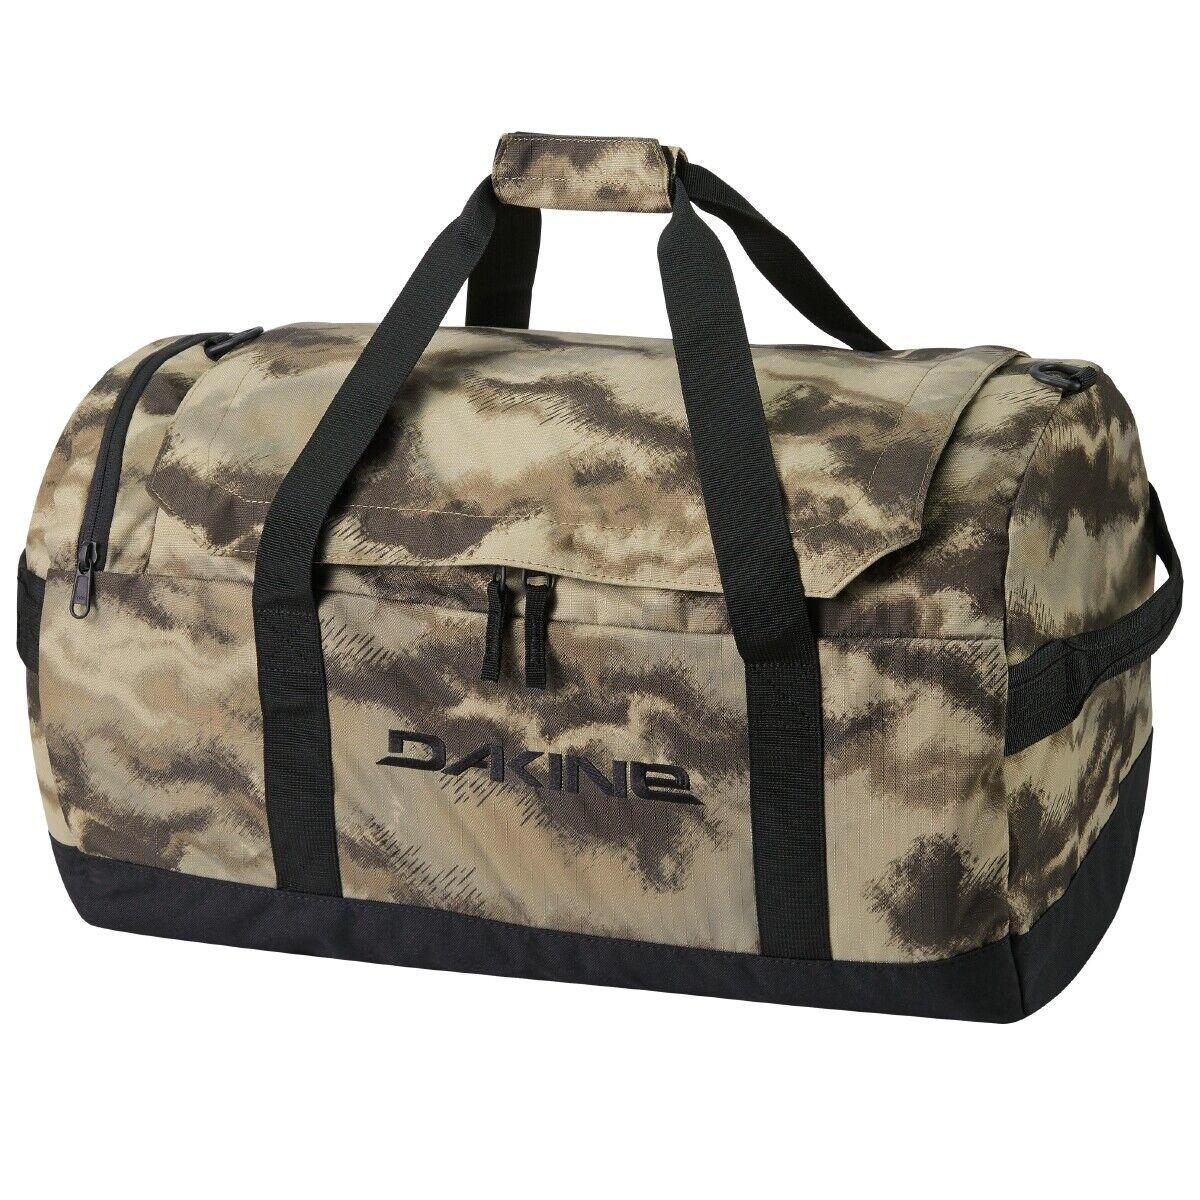 Dakine eq duffle 50l funda bolsa de viaje bolsa de gimnasia ashcroft 10002061-ashcroftcm